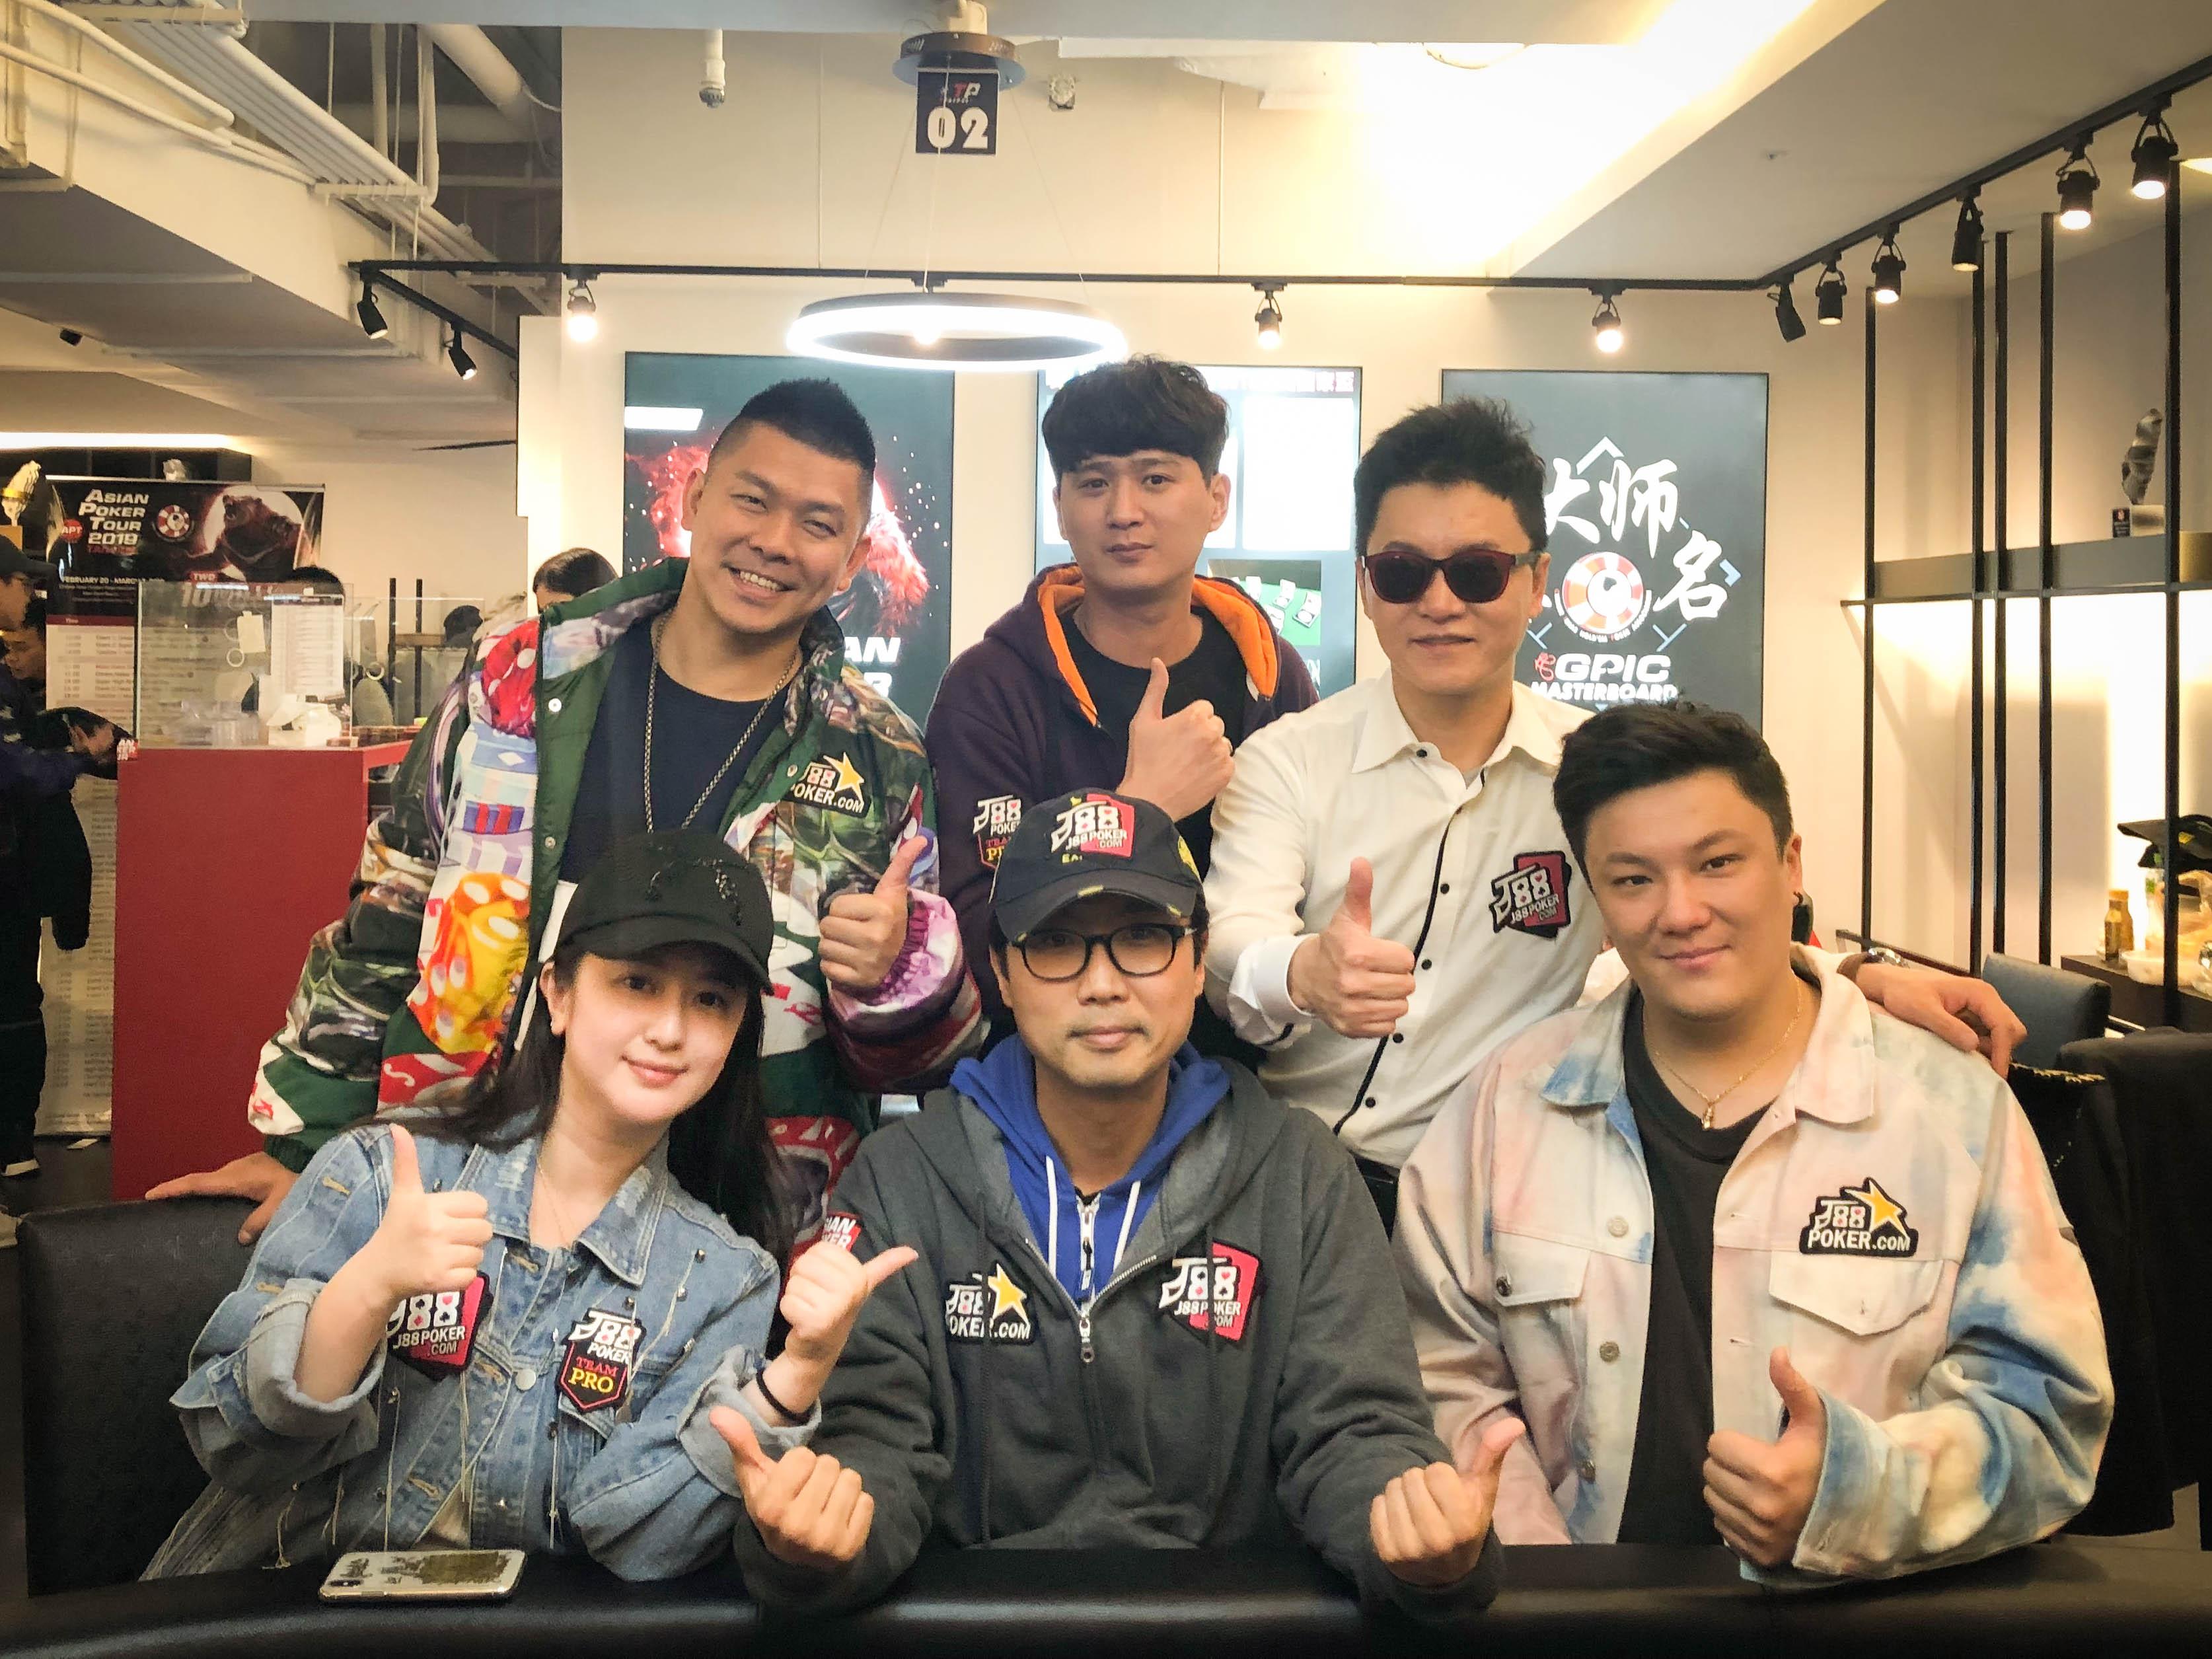 Meet the J88Poker Team Pros